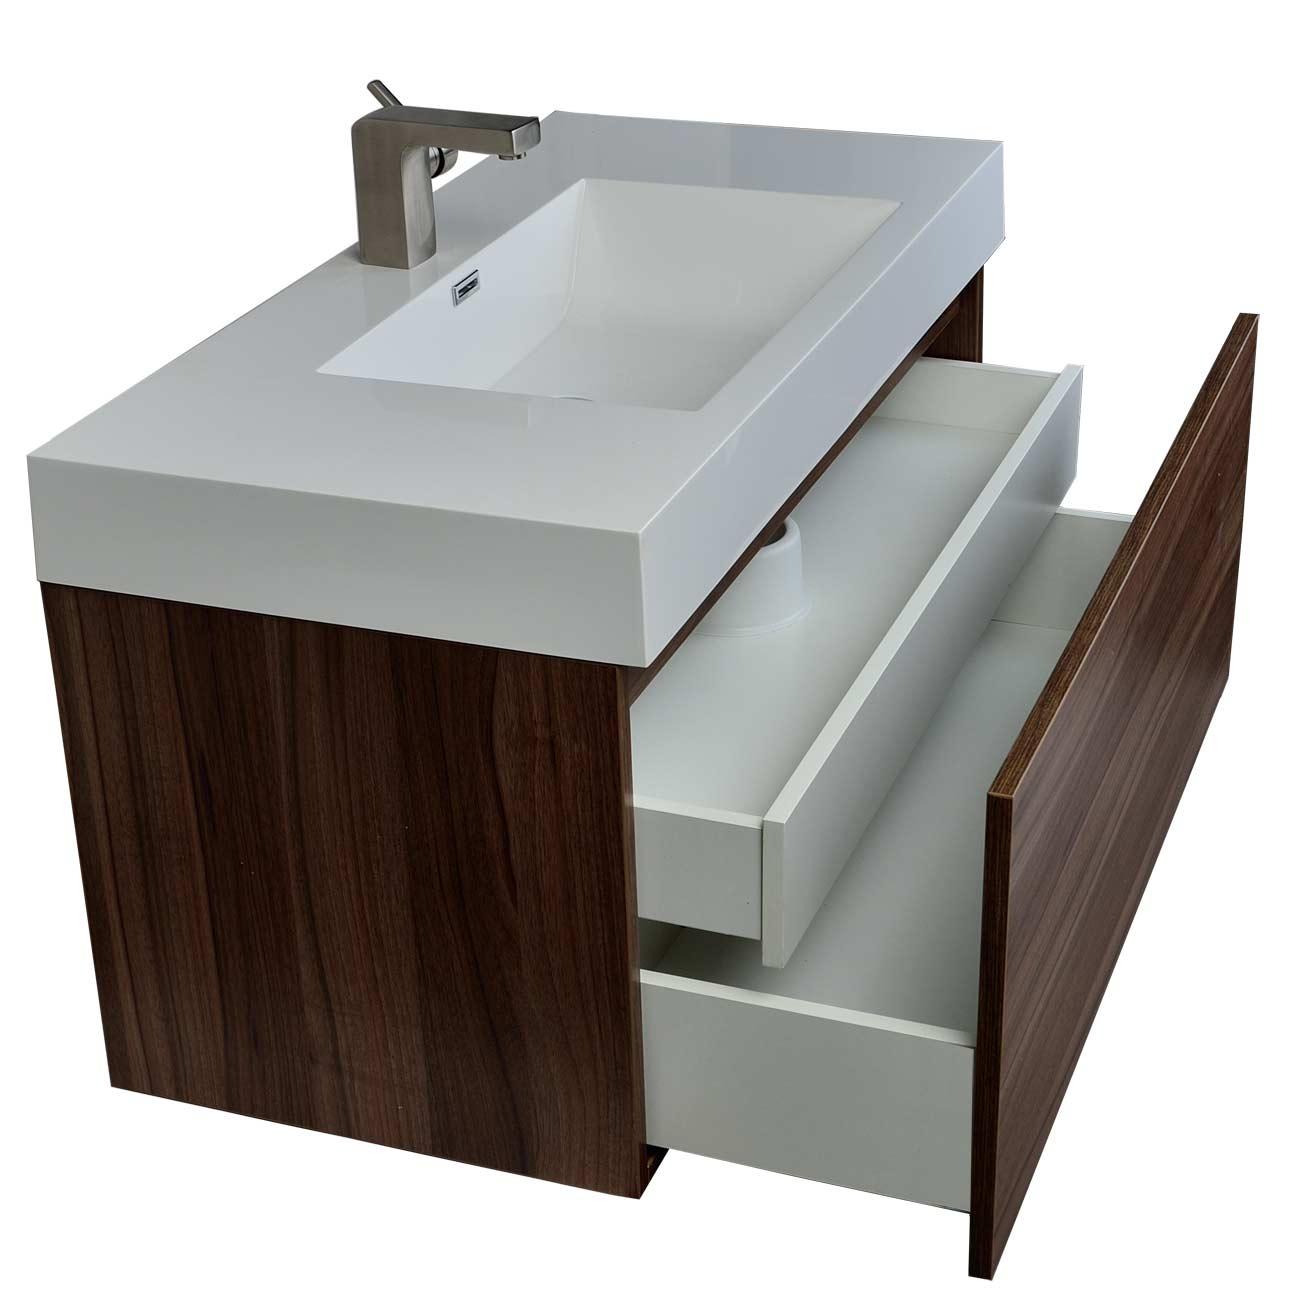 Modern Bathroom Vanity in Walnut Finish TNA1000WN